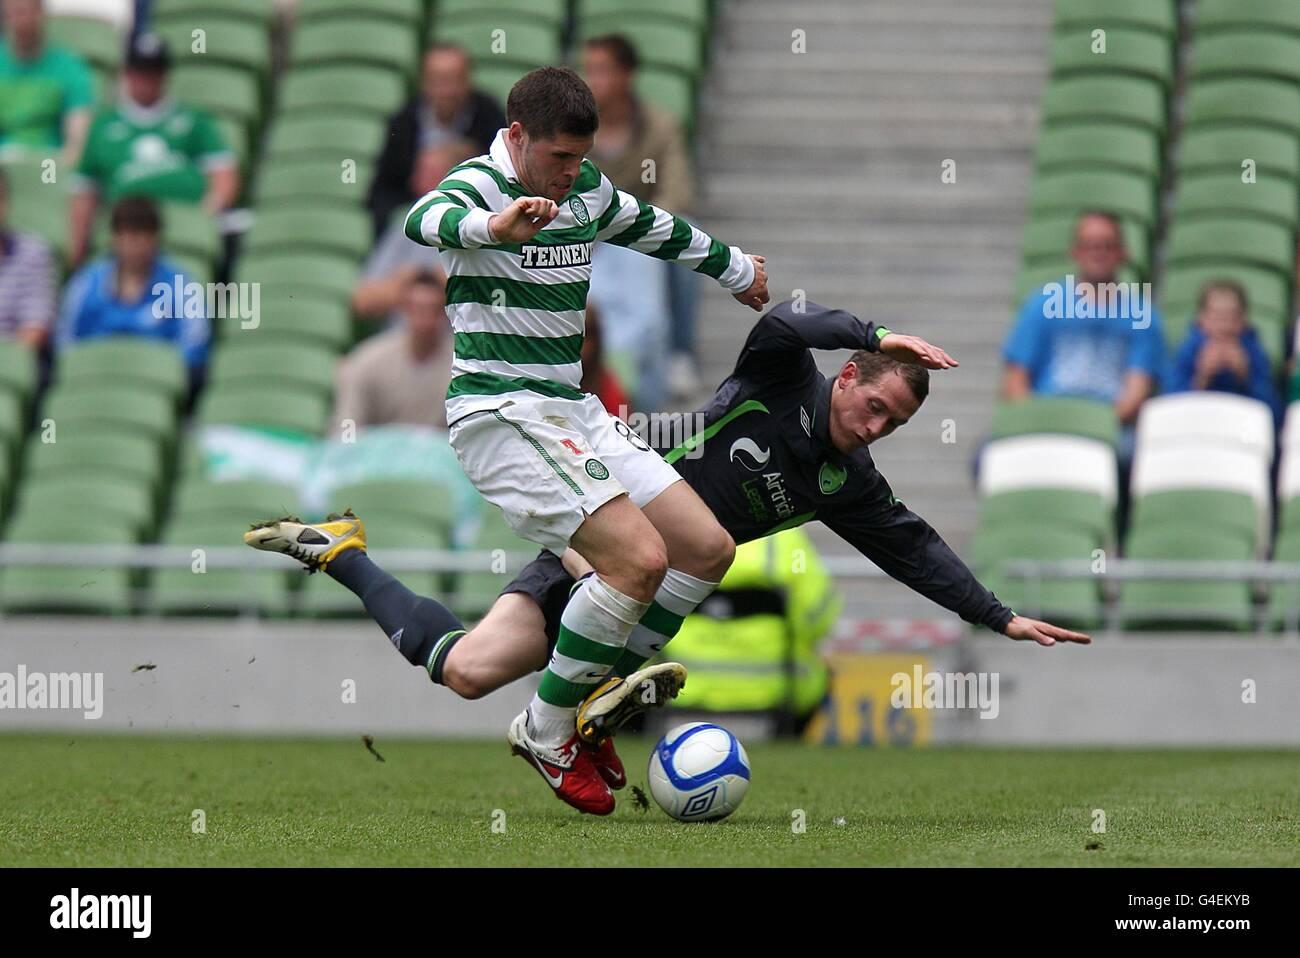 Soccer - Pre Season Friendly - The Dublin Super Cup - Airtricity XI v Celtic - Aviva Stadium - Stock Image